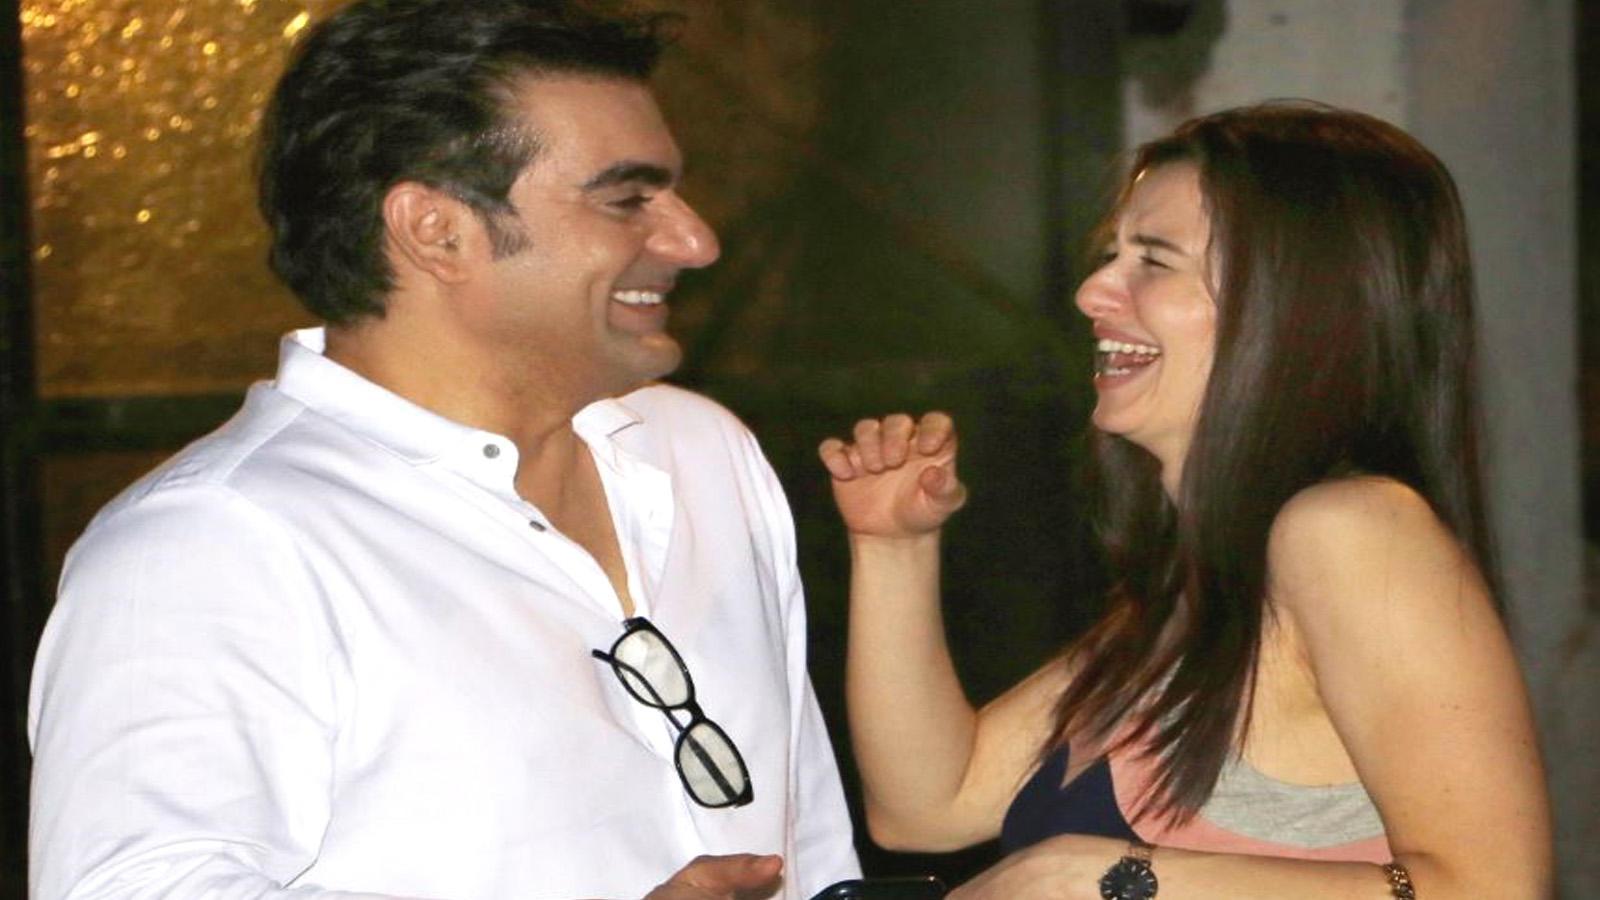 arbaaz-khan-celebrates-rumoured-girlfriend-giorgia-andrianis-birthday